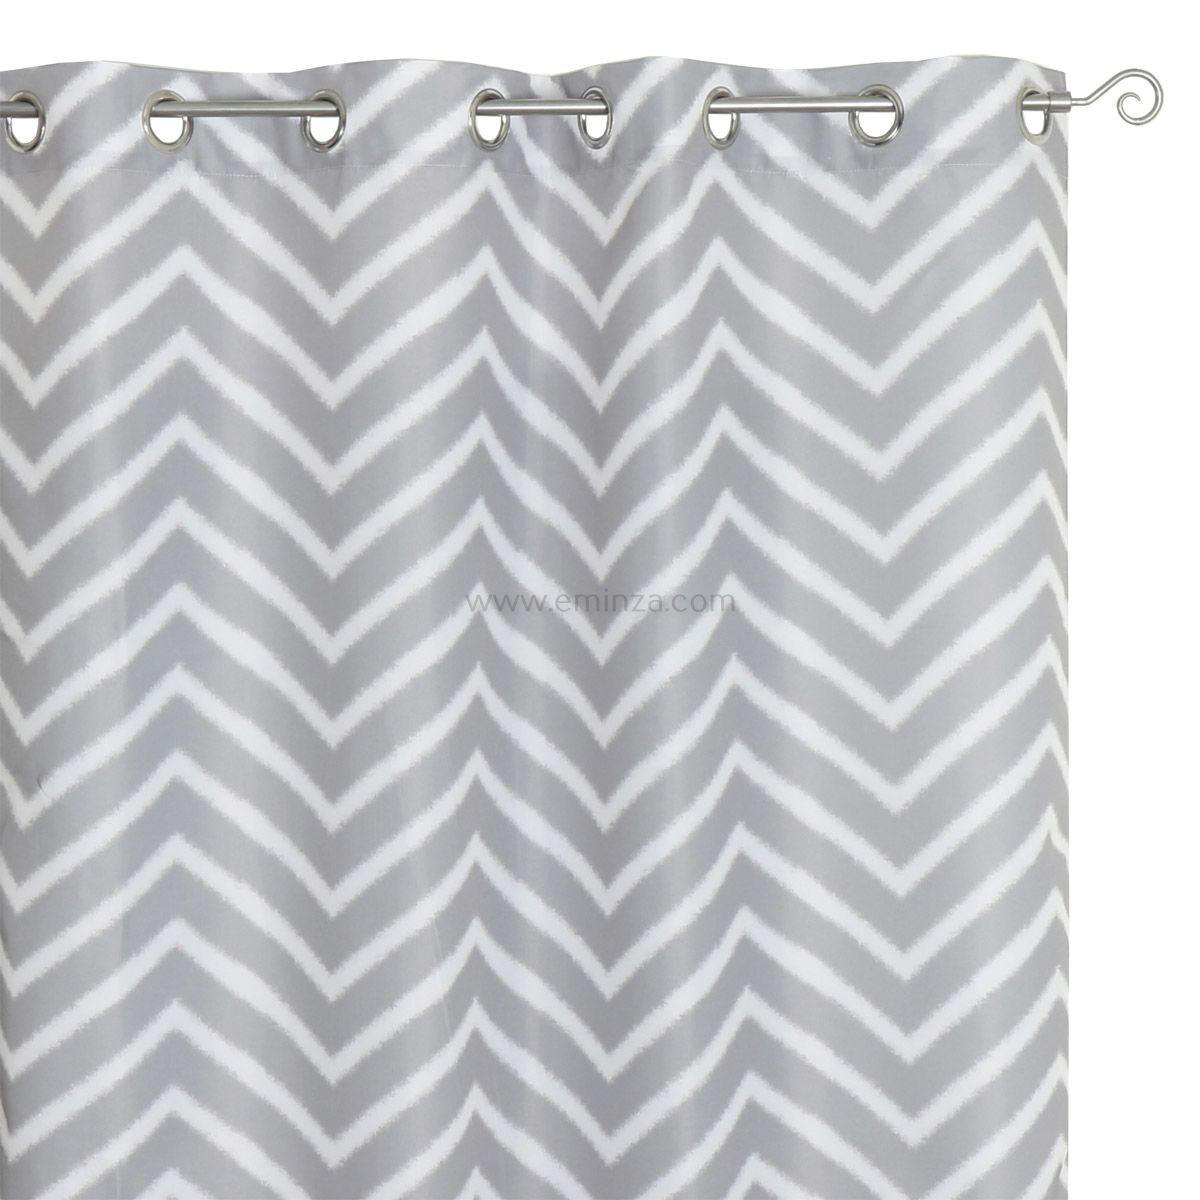 rideau 140 x h260 cm zigzag gris rideau tamisant eminza. Black Bedroom Furniture Sets. Home Design Ideas